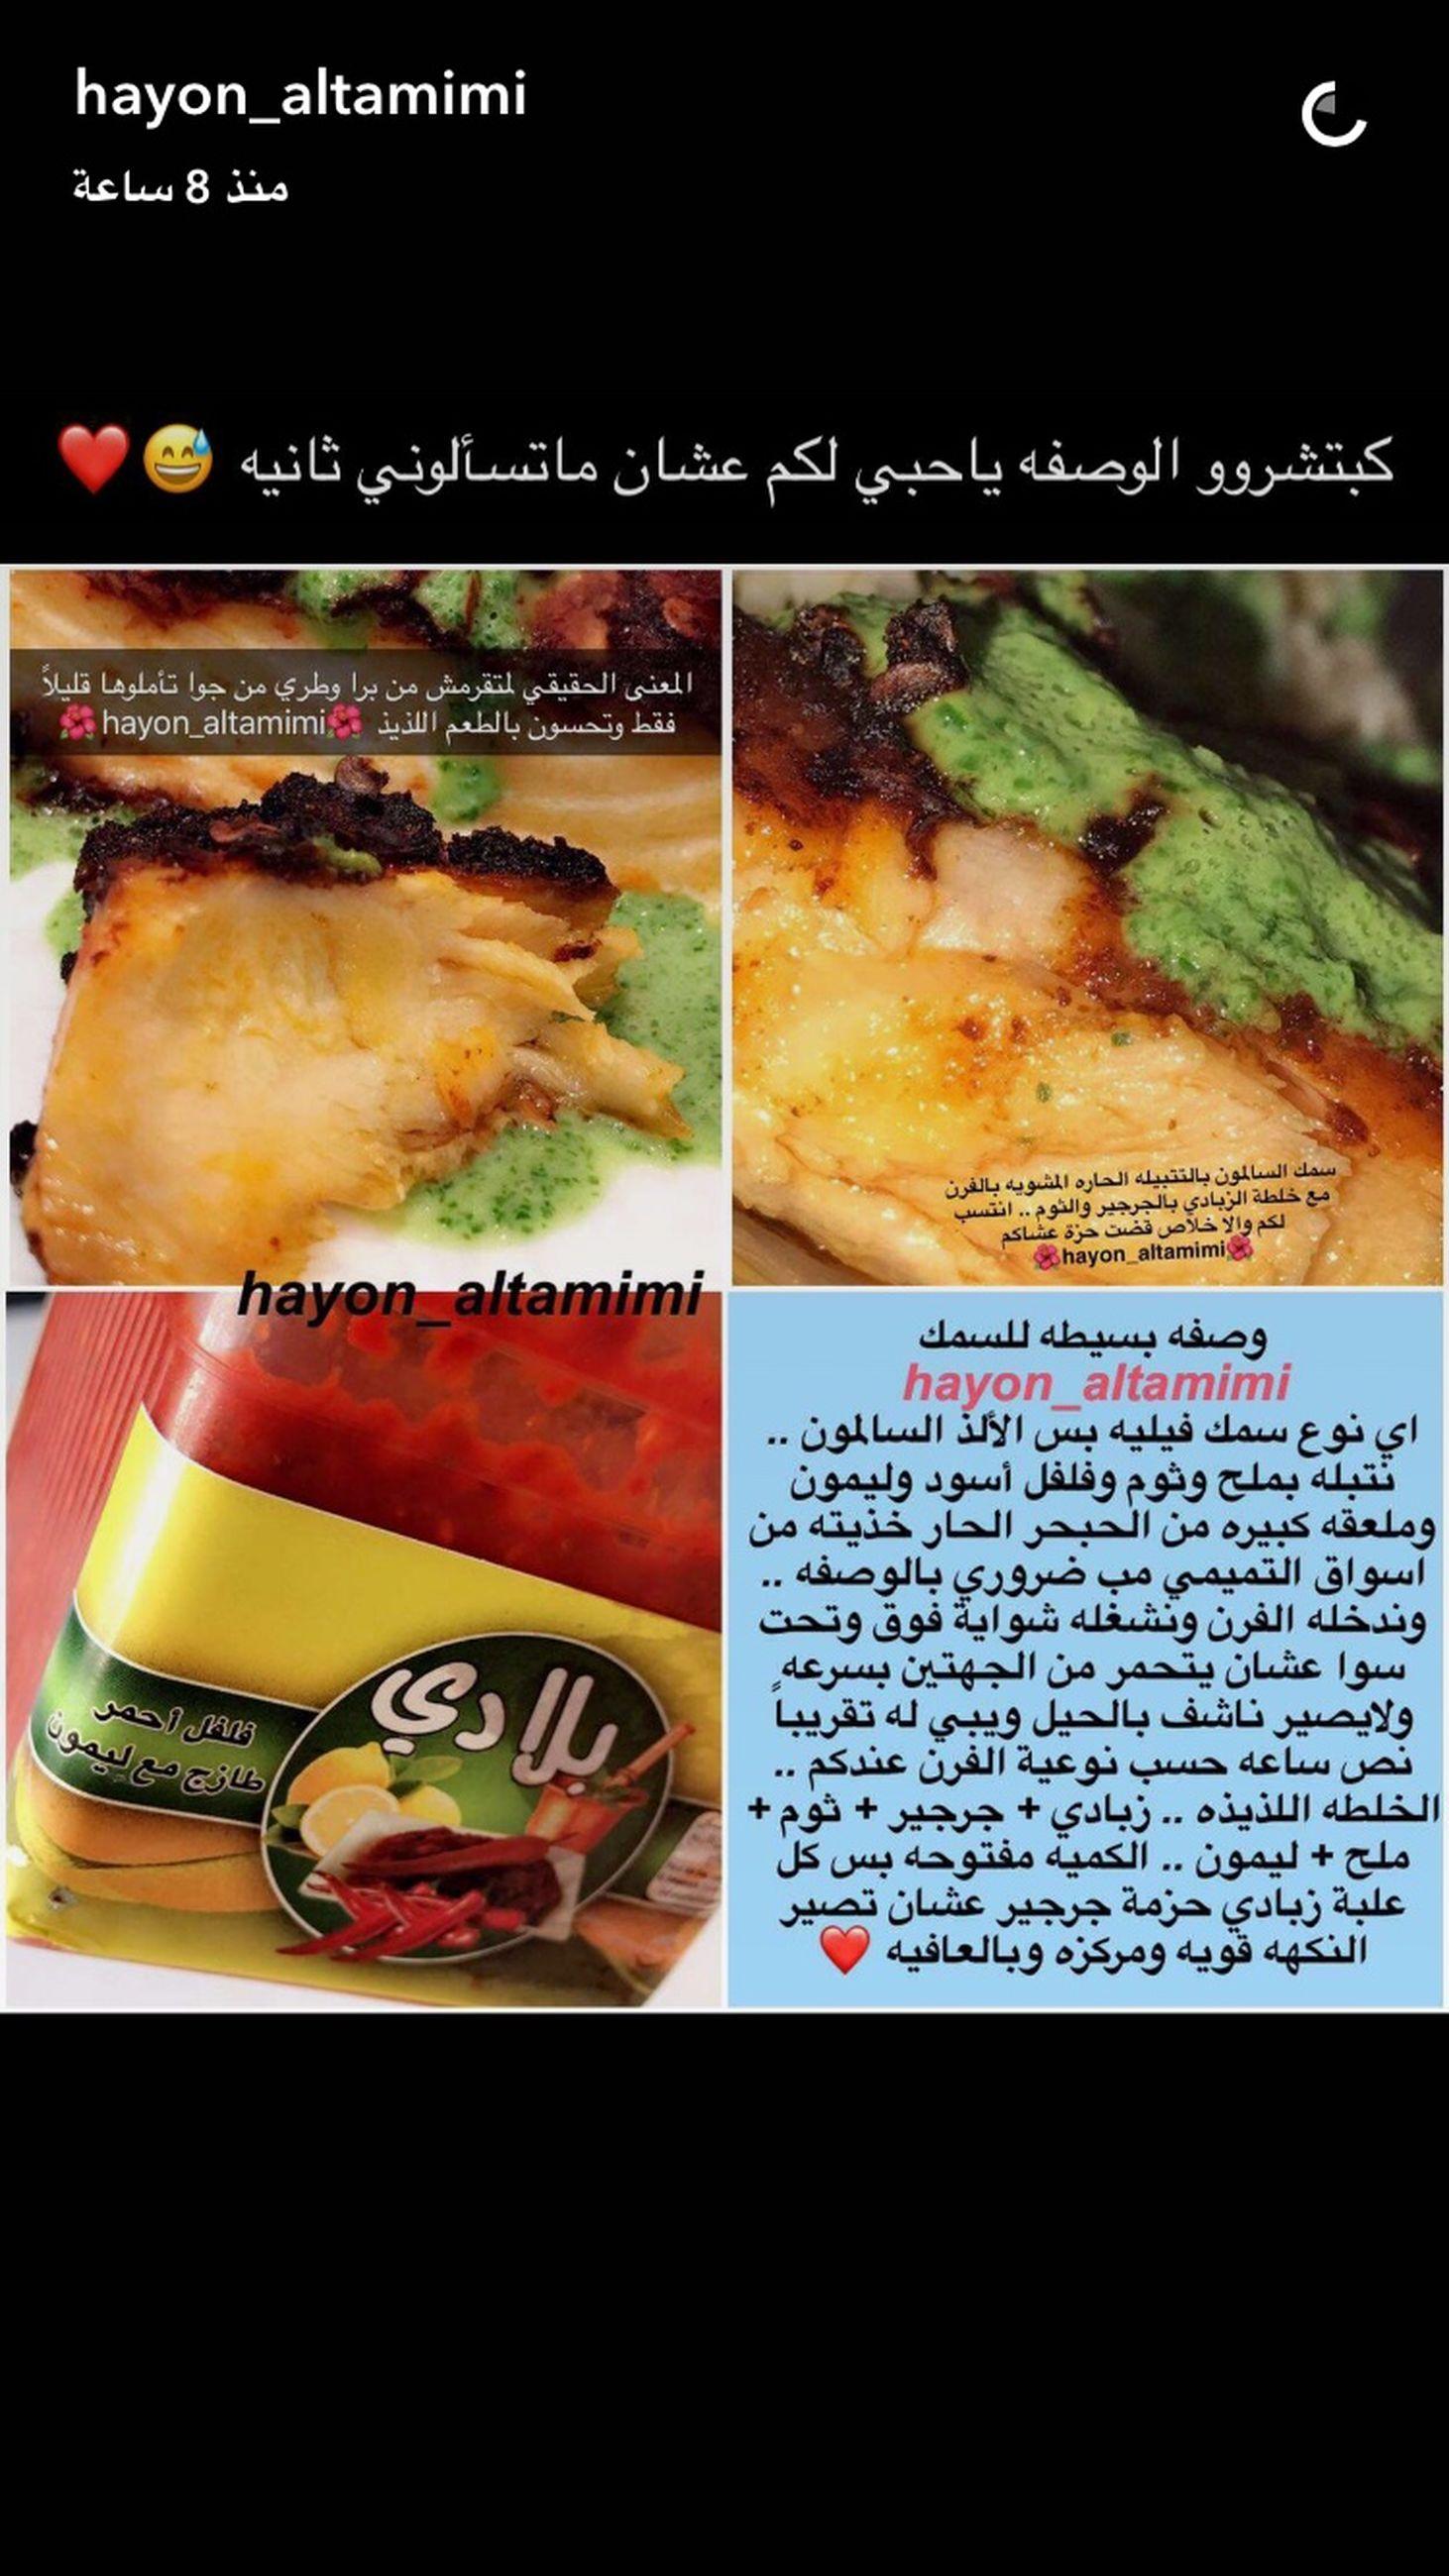 digital composite, collage, composite image, food and drink, food, variation, multiple image, no people, freshness